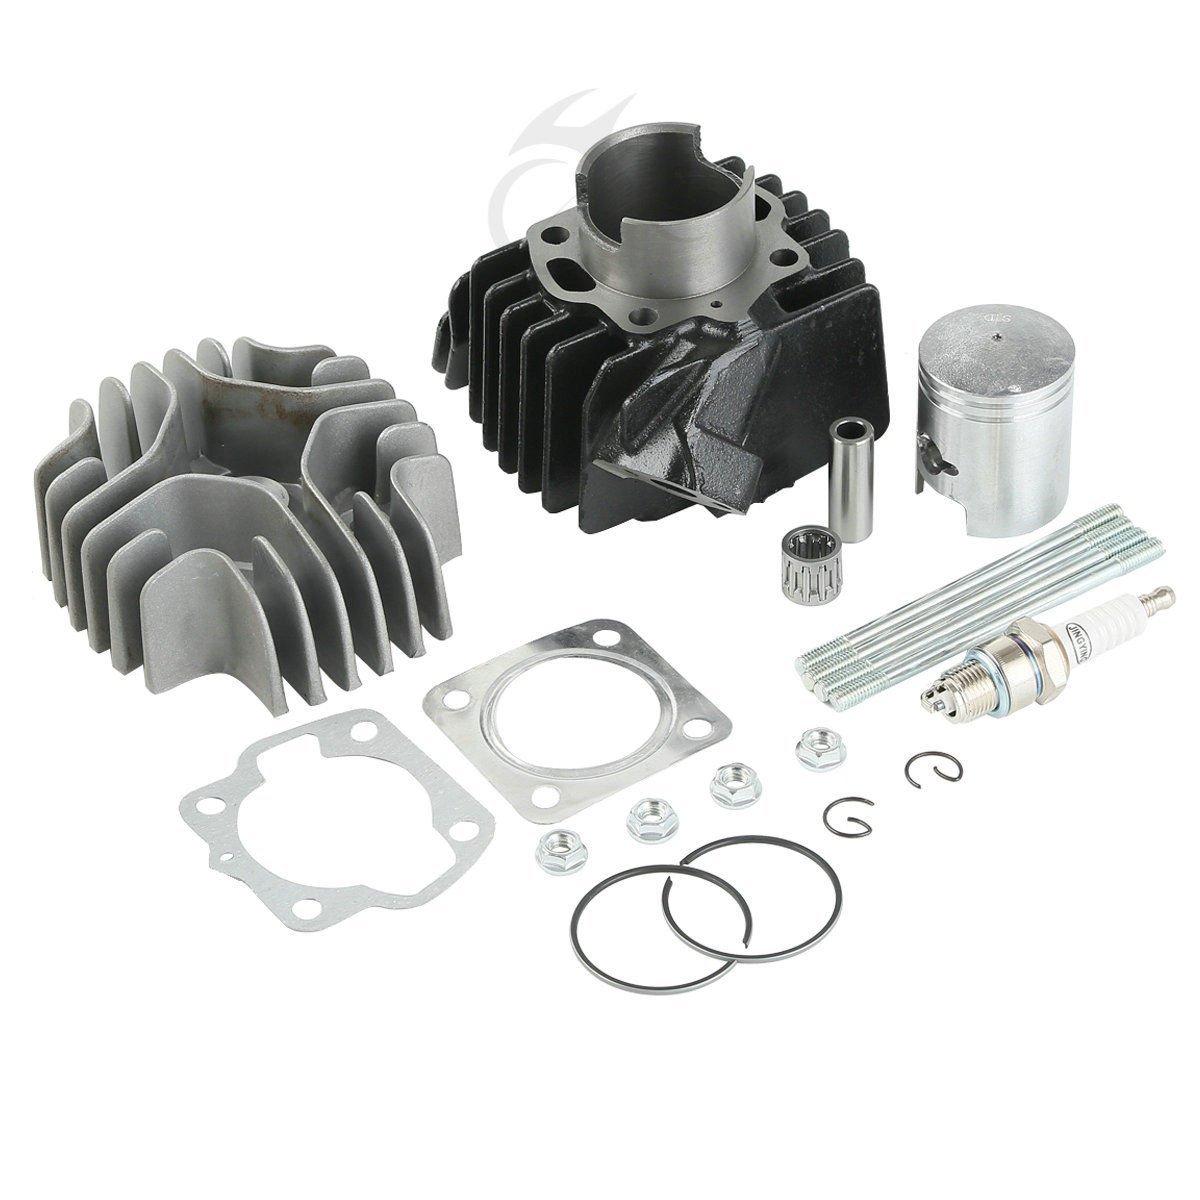 Homyl Replacement Piston Ring Cylinder Gasket Kit for Suzuki JR50 LT50 ALT50 LTA50